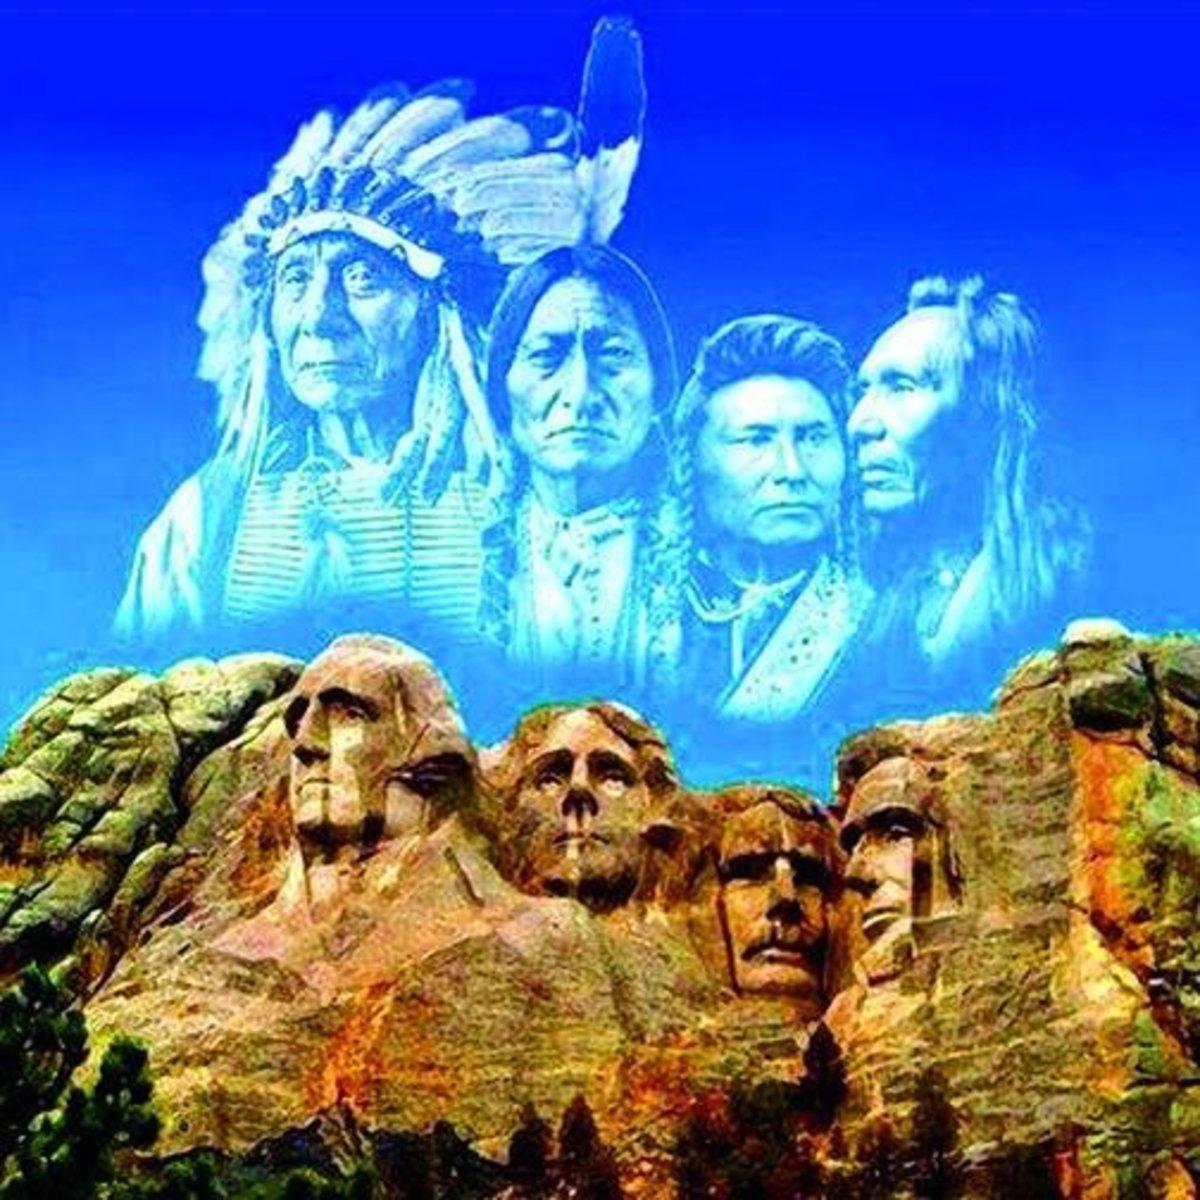 natures-freedom-heavens-freedom-human-freedom-and-liberation-saturdays-inspiration-40